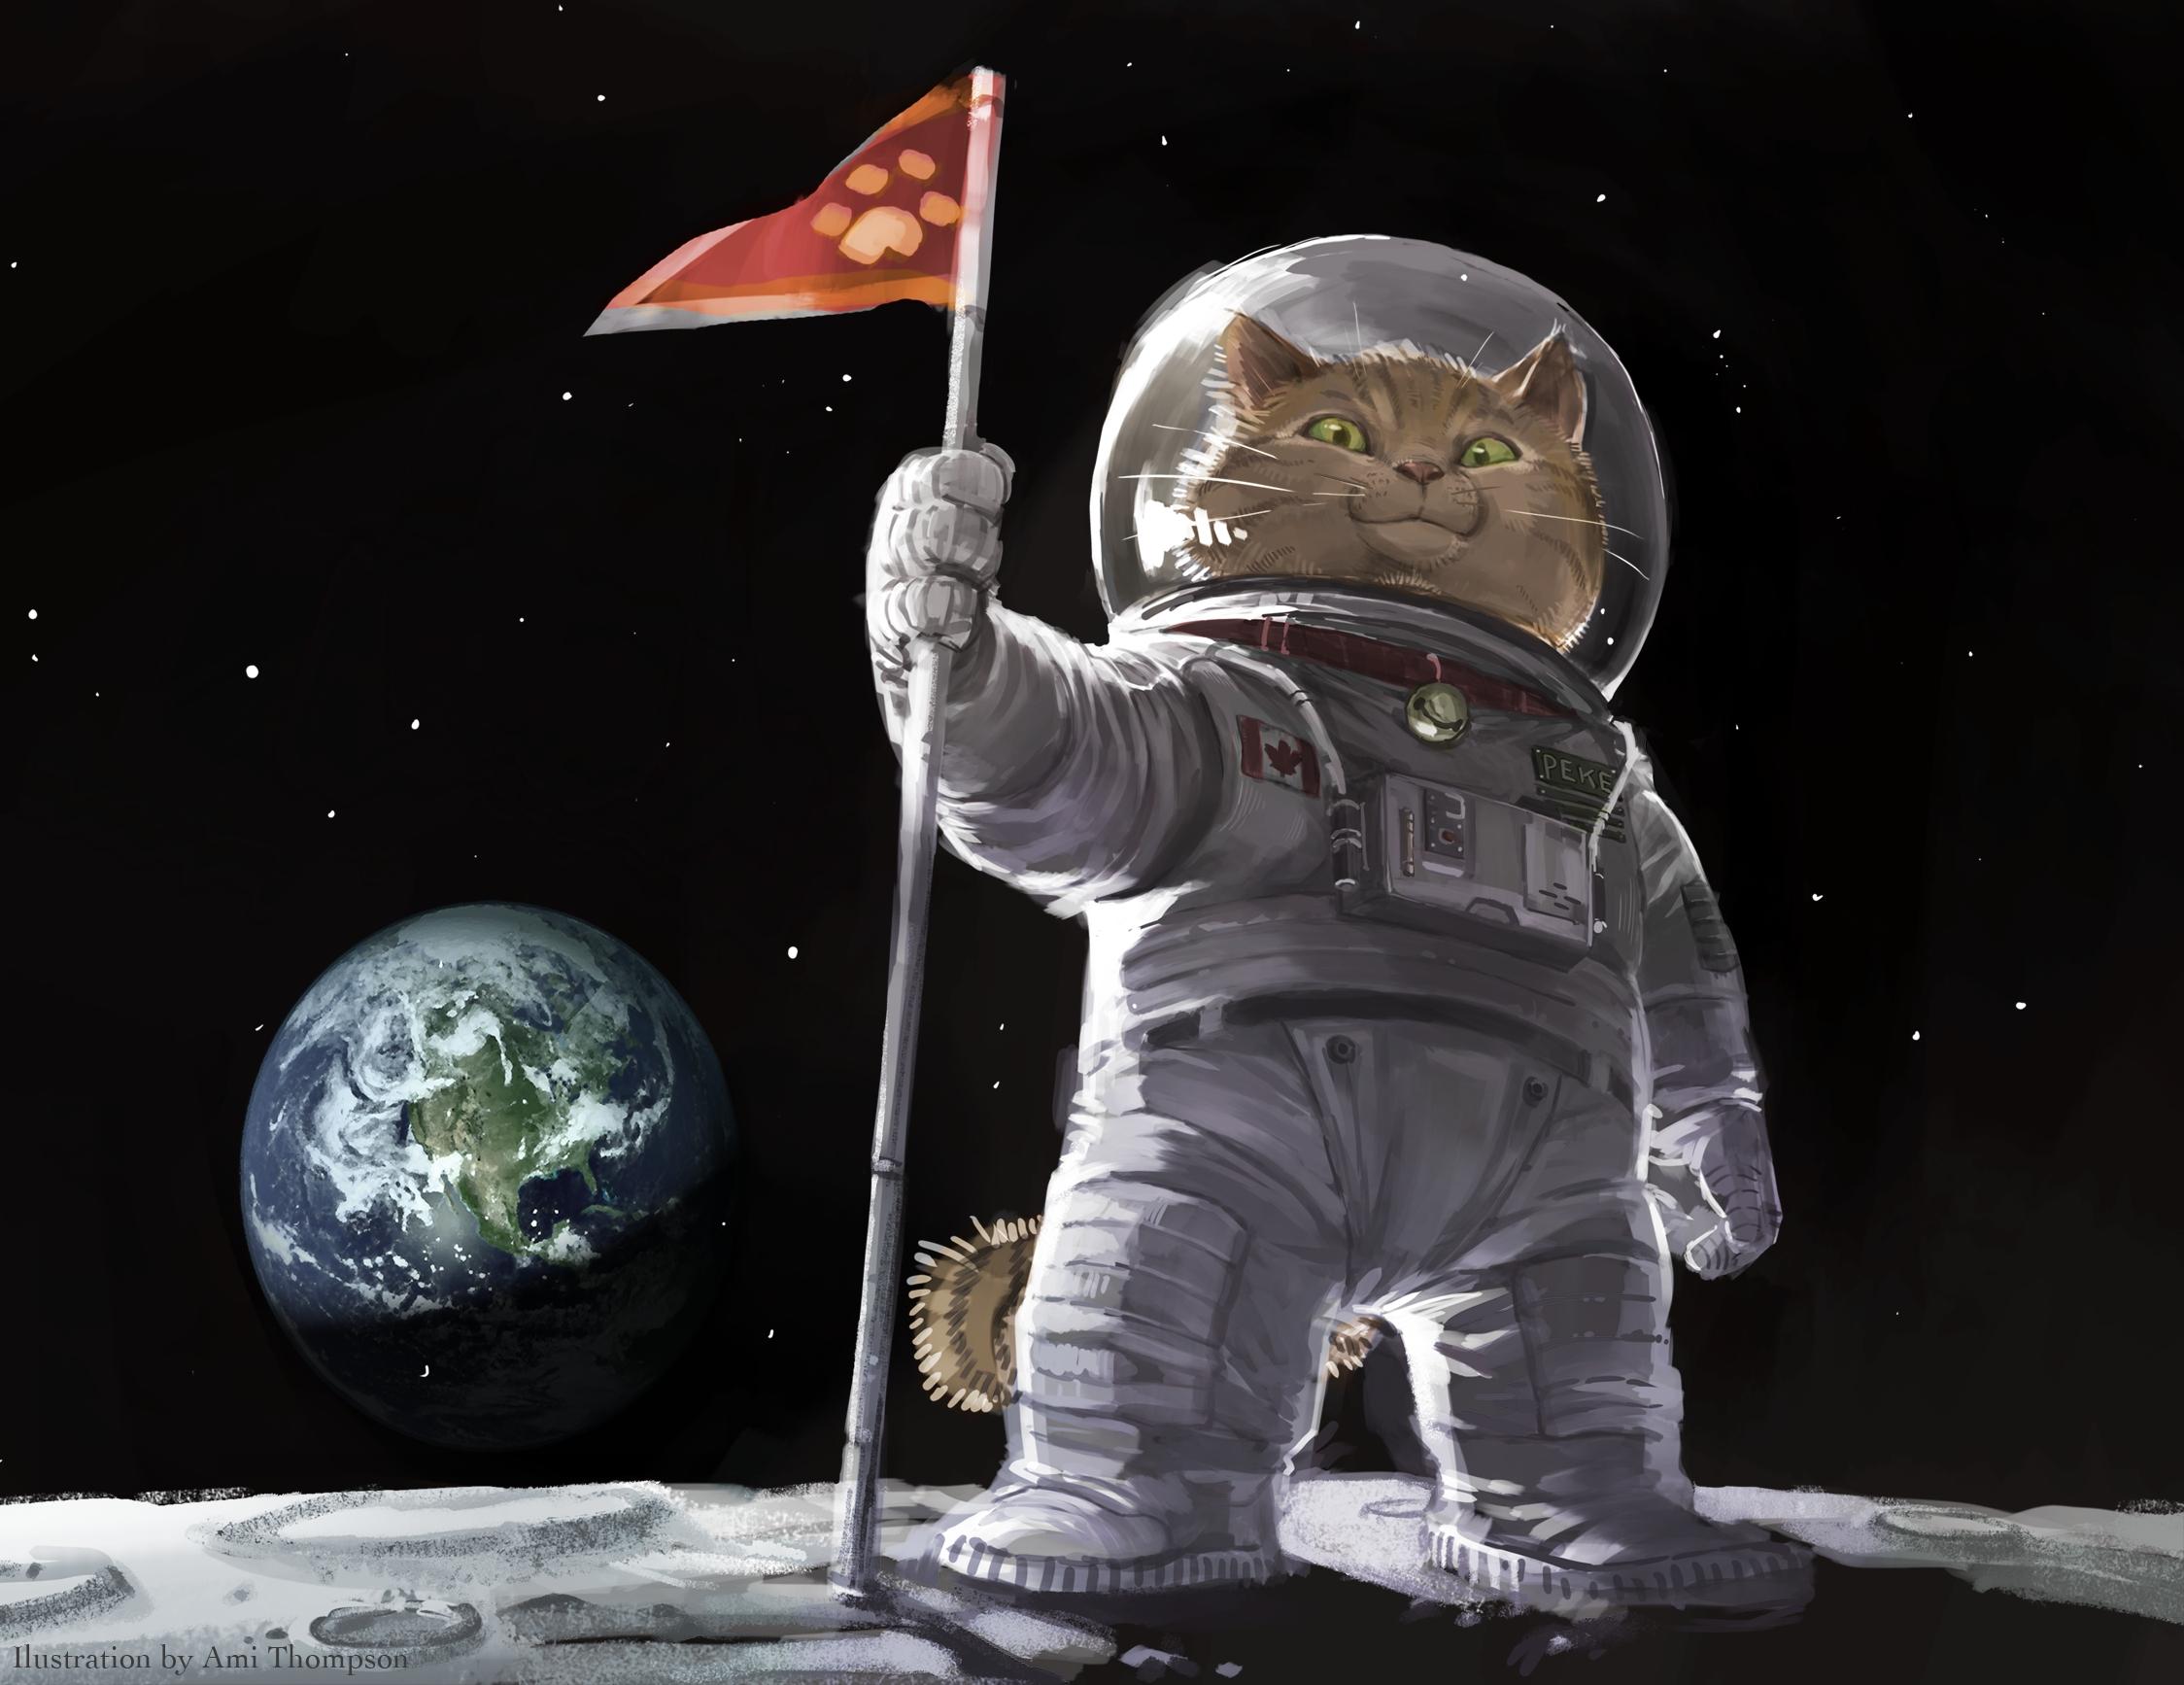 Ami Thompson original cat space planets humor wallpaper 2248x1734 2248x1734